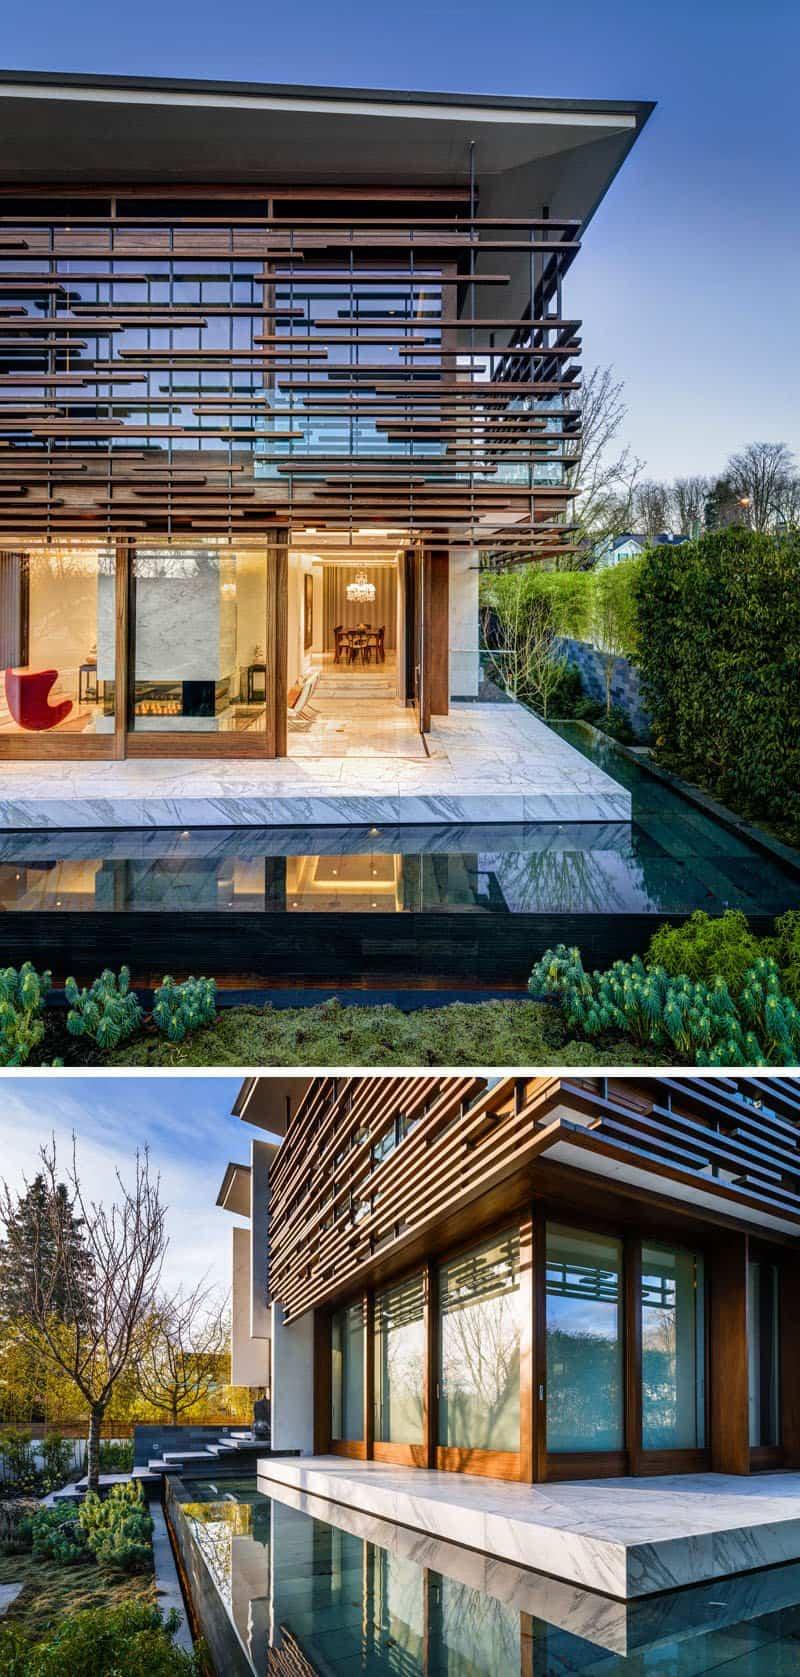 casa contemporanea listones de madera 2